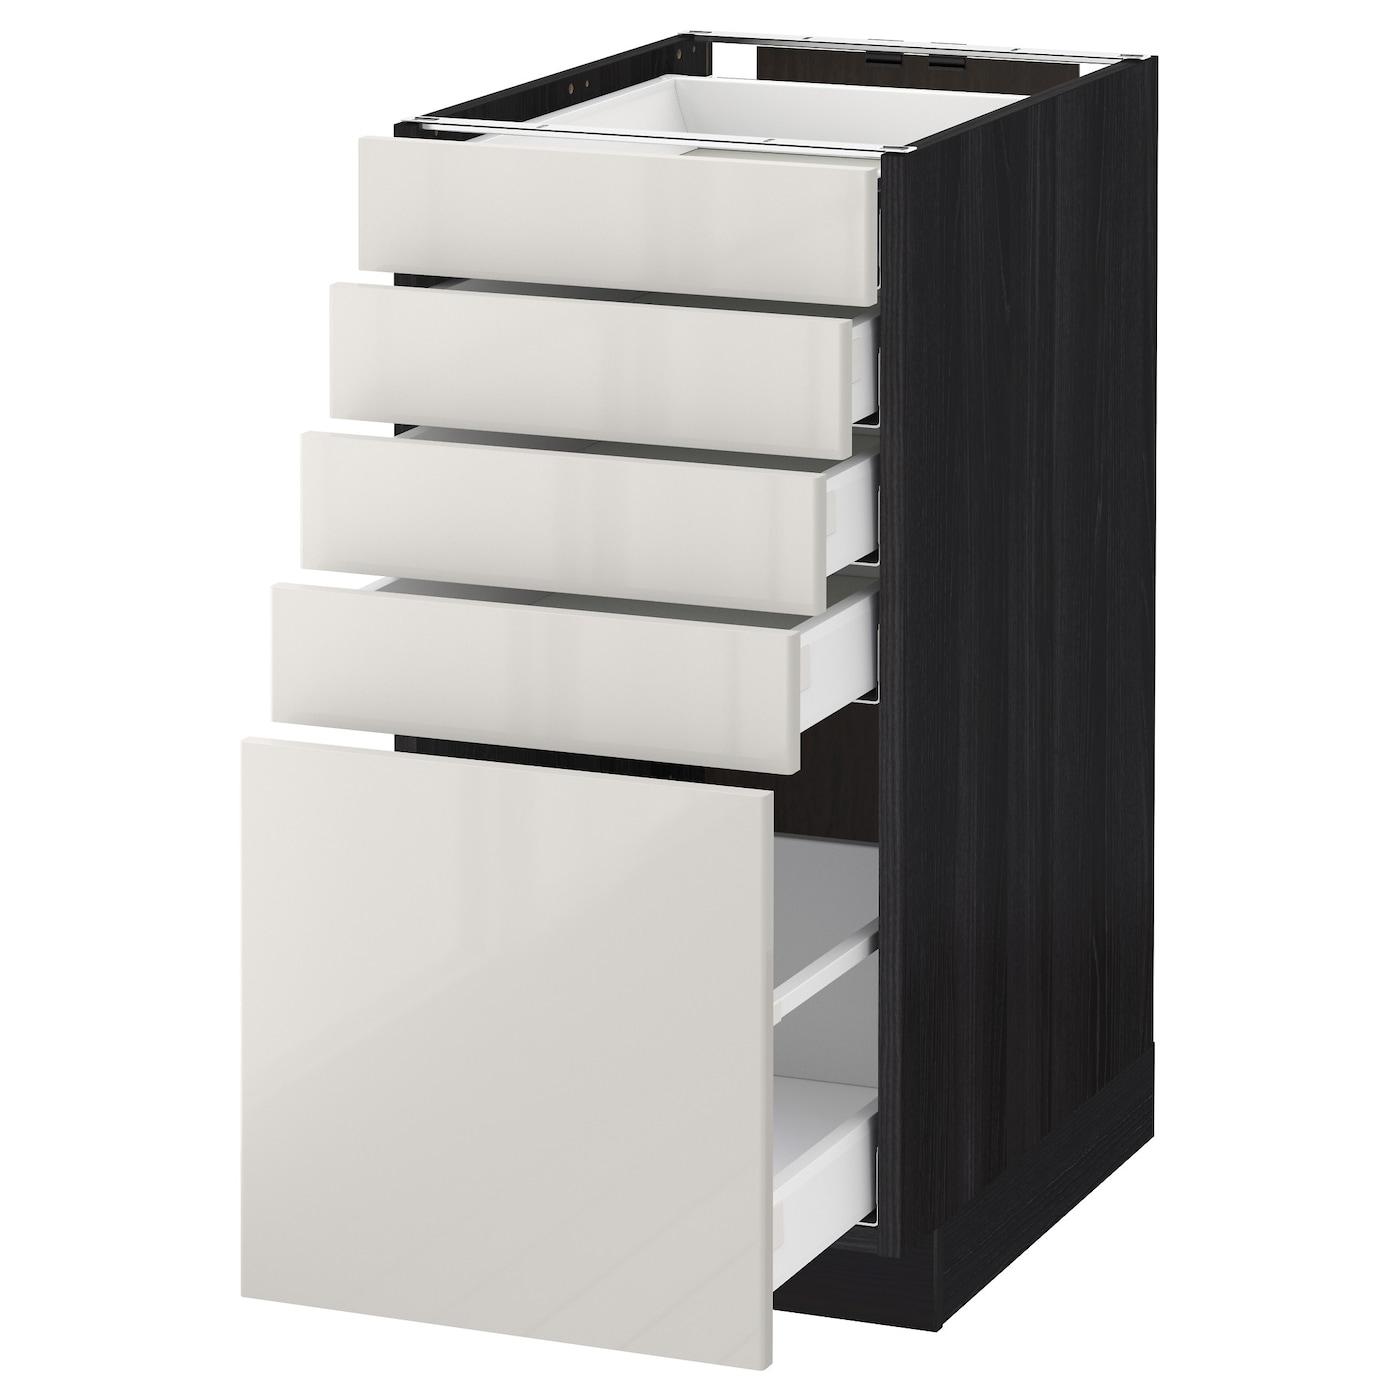 metod maximera base cabinet with 5 drawers black ringhult light grey 40 x 60 cm ikea. Black Bedroom Furniture Sets. Home Design Ideas